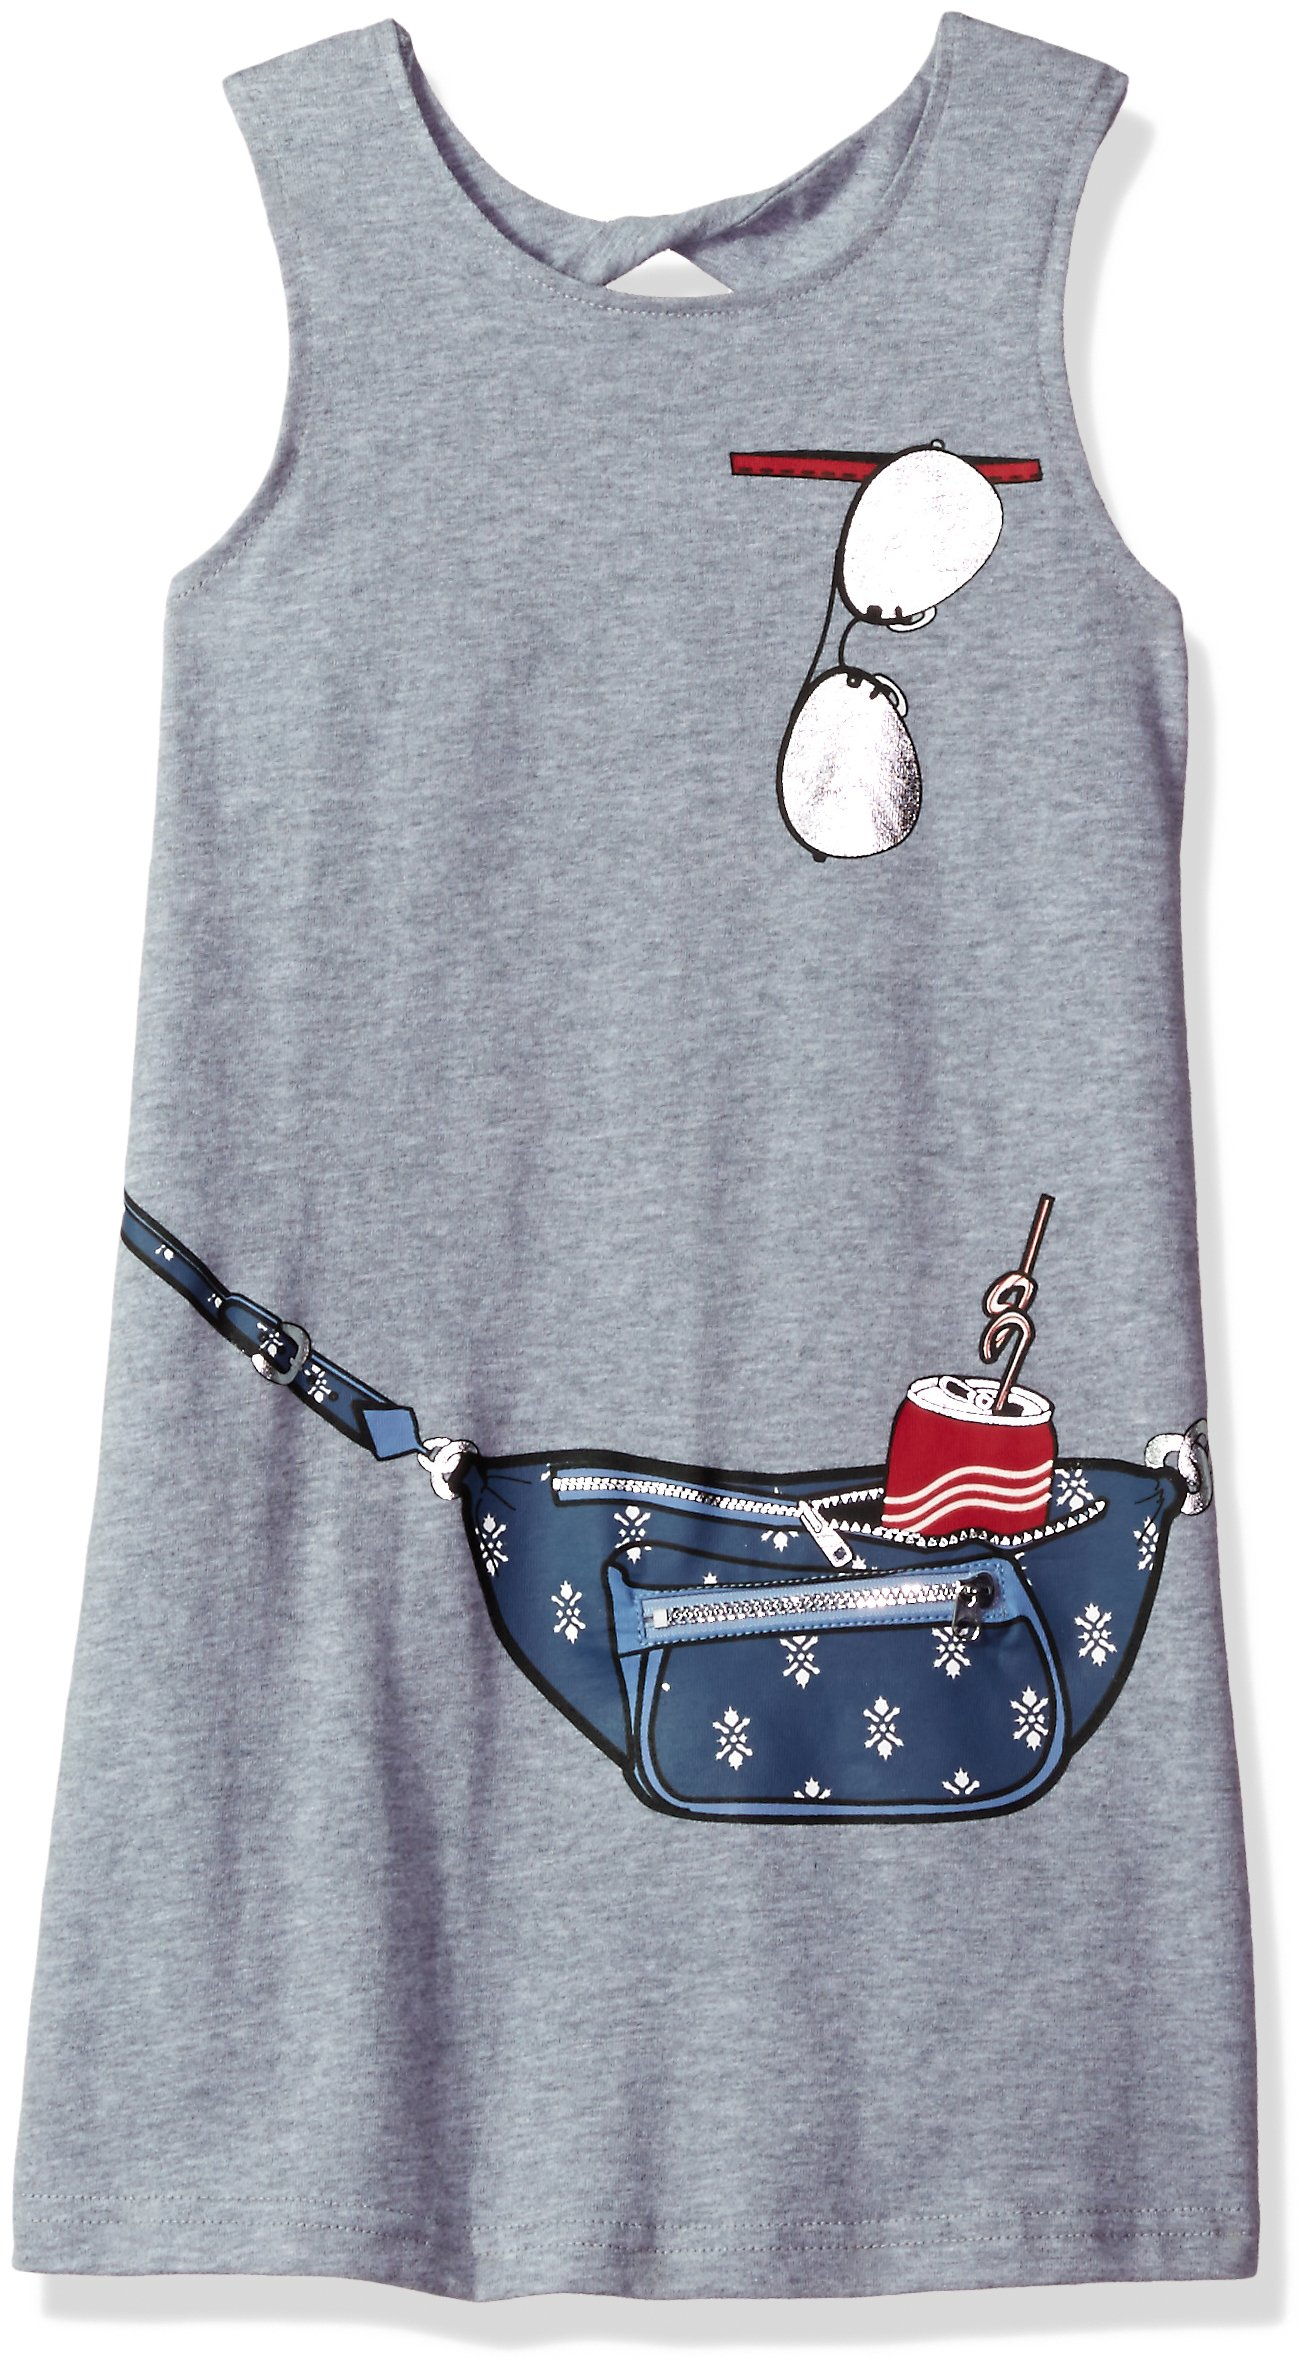 Jessica Simpson Little Girls' Purse and Sunglass Print Tank Dress, Heather Gray, 5